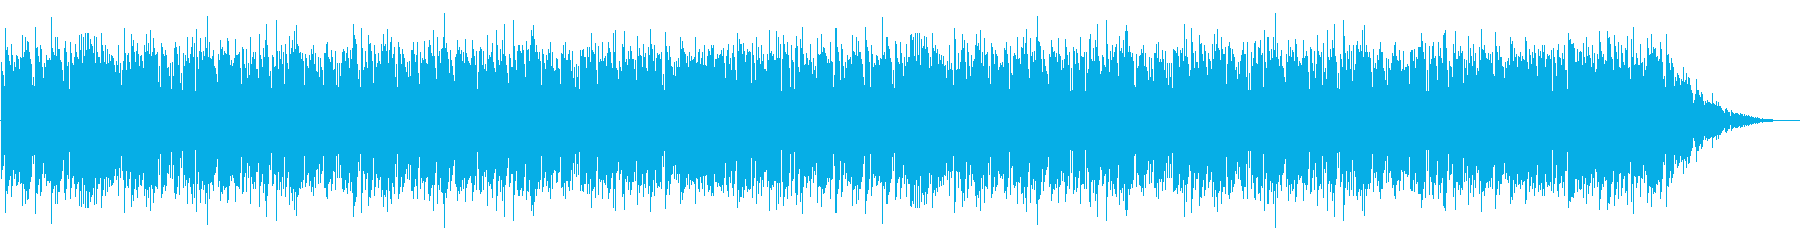 NES アクションC05-1(ステージ3の再生済みの波形